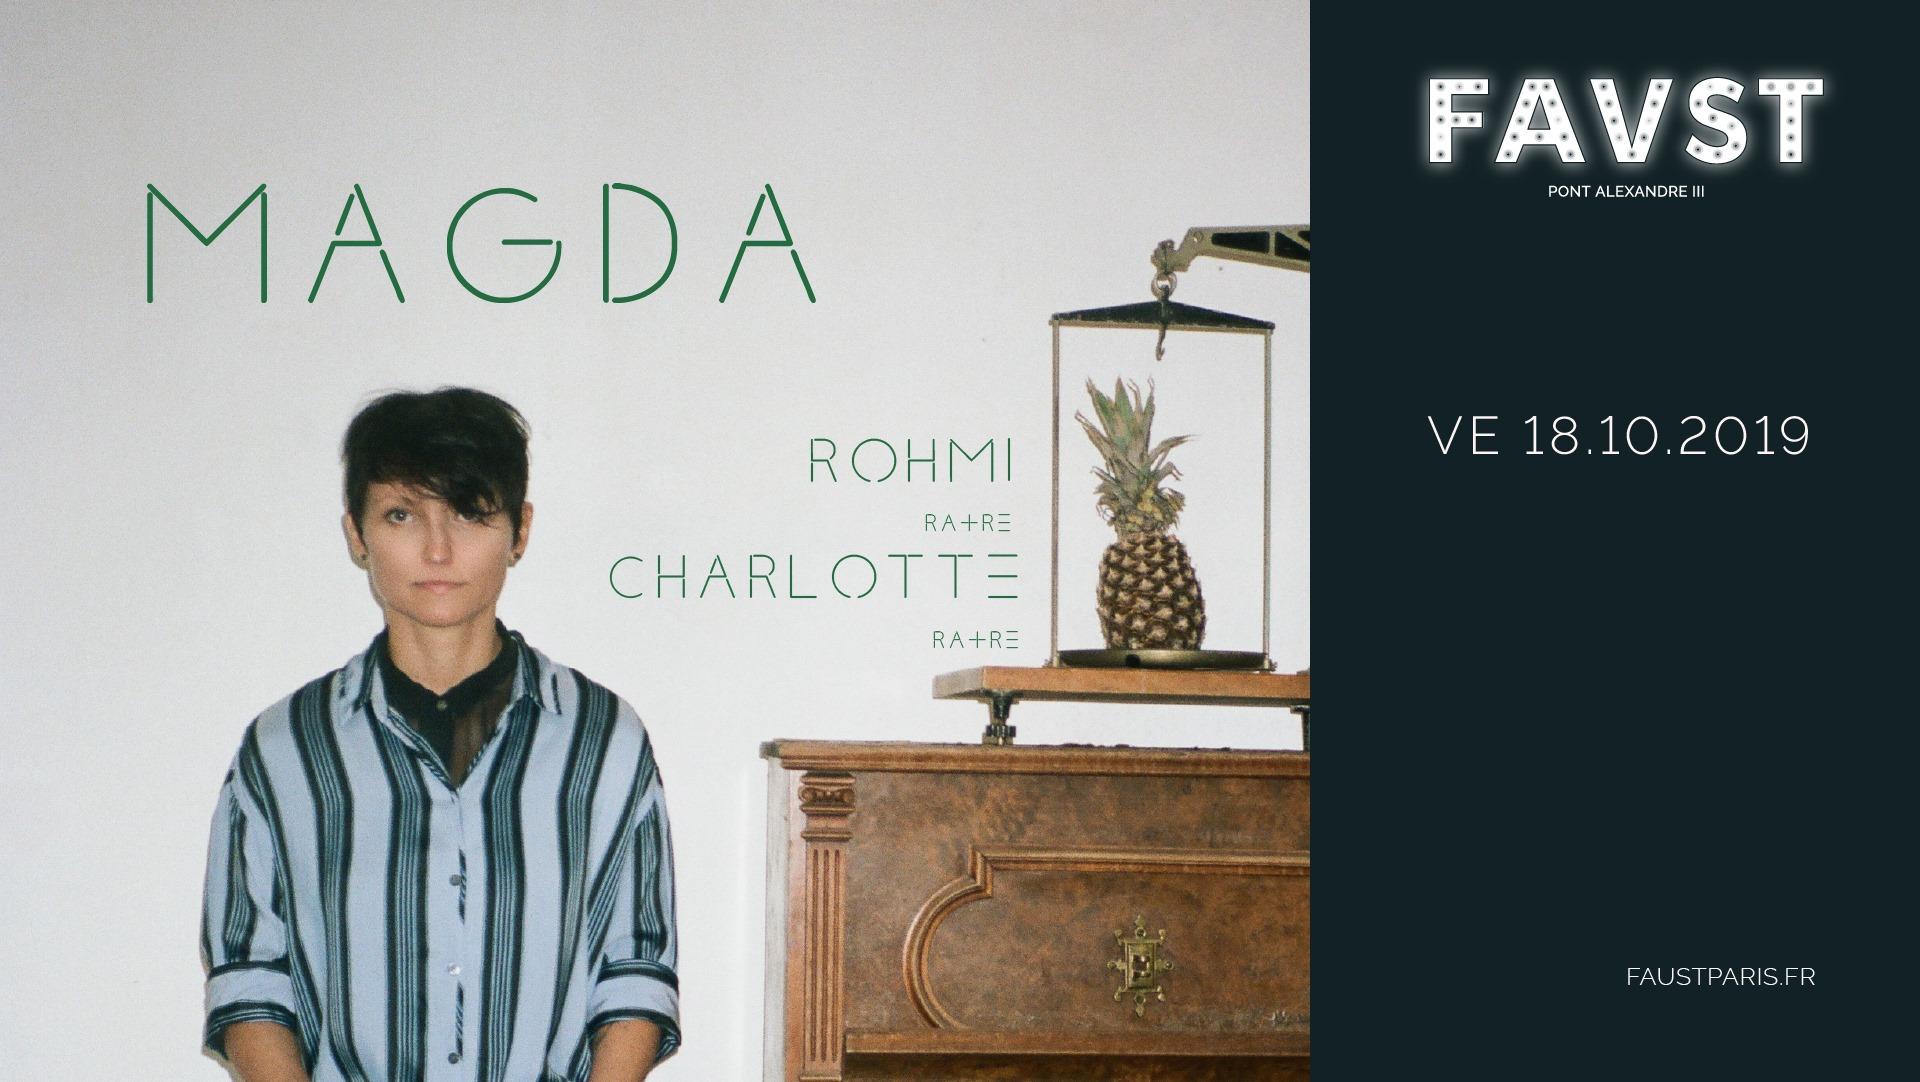 Faust: Magda, Rohmi, Charlotte